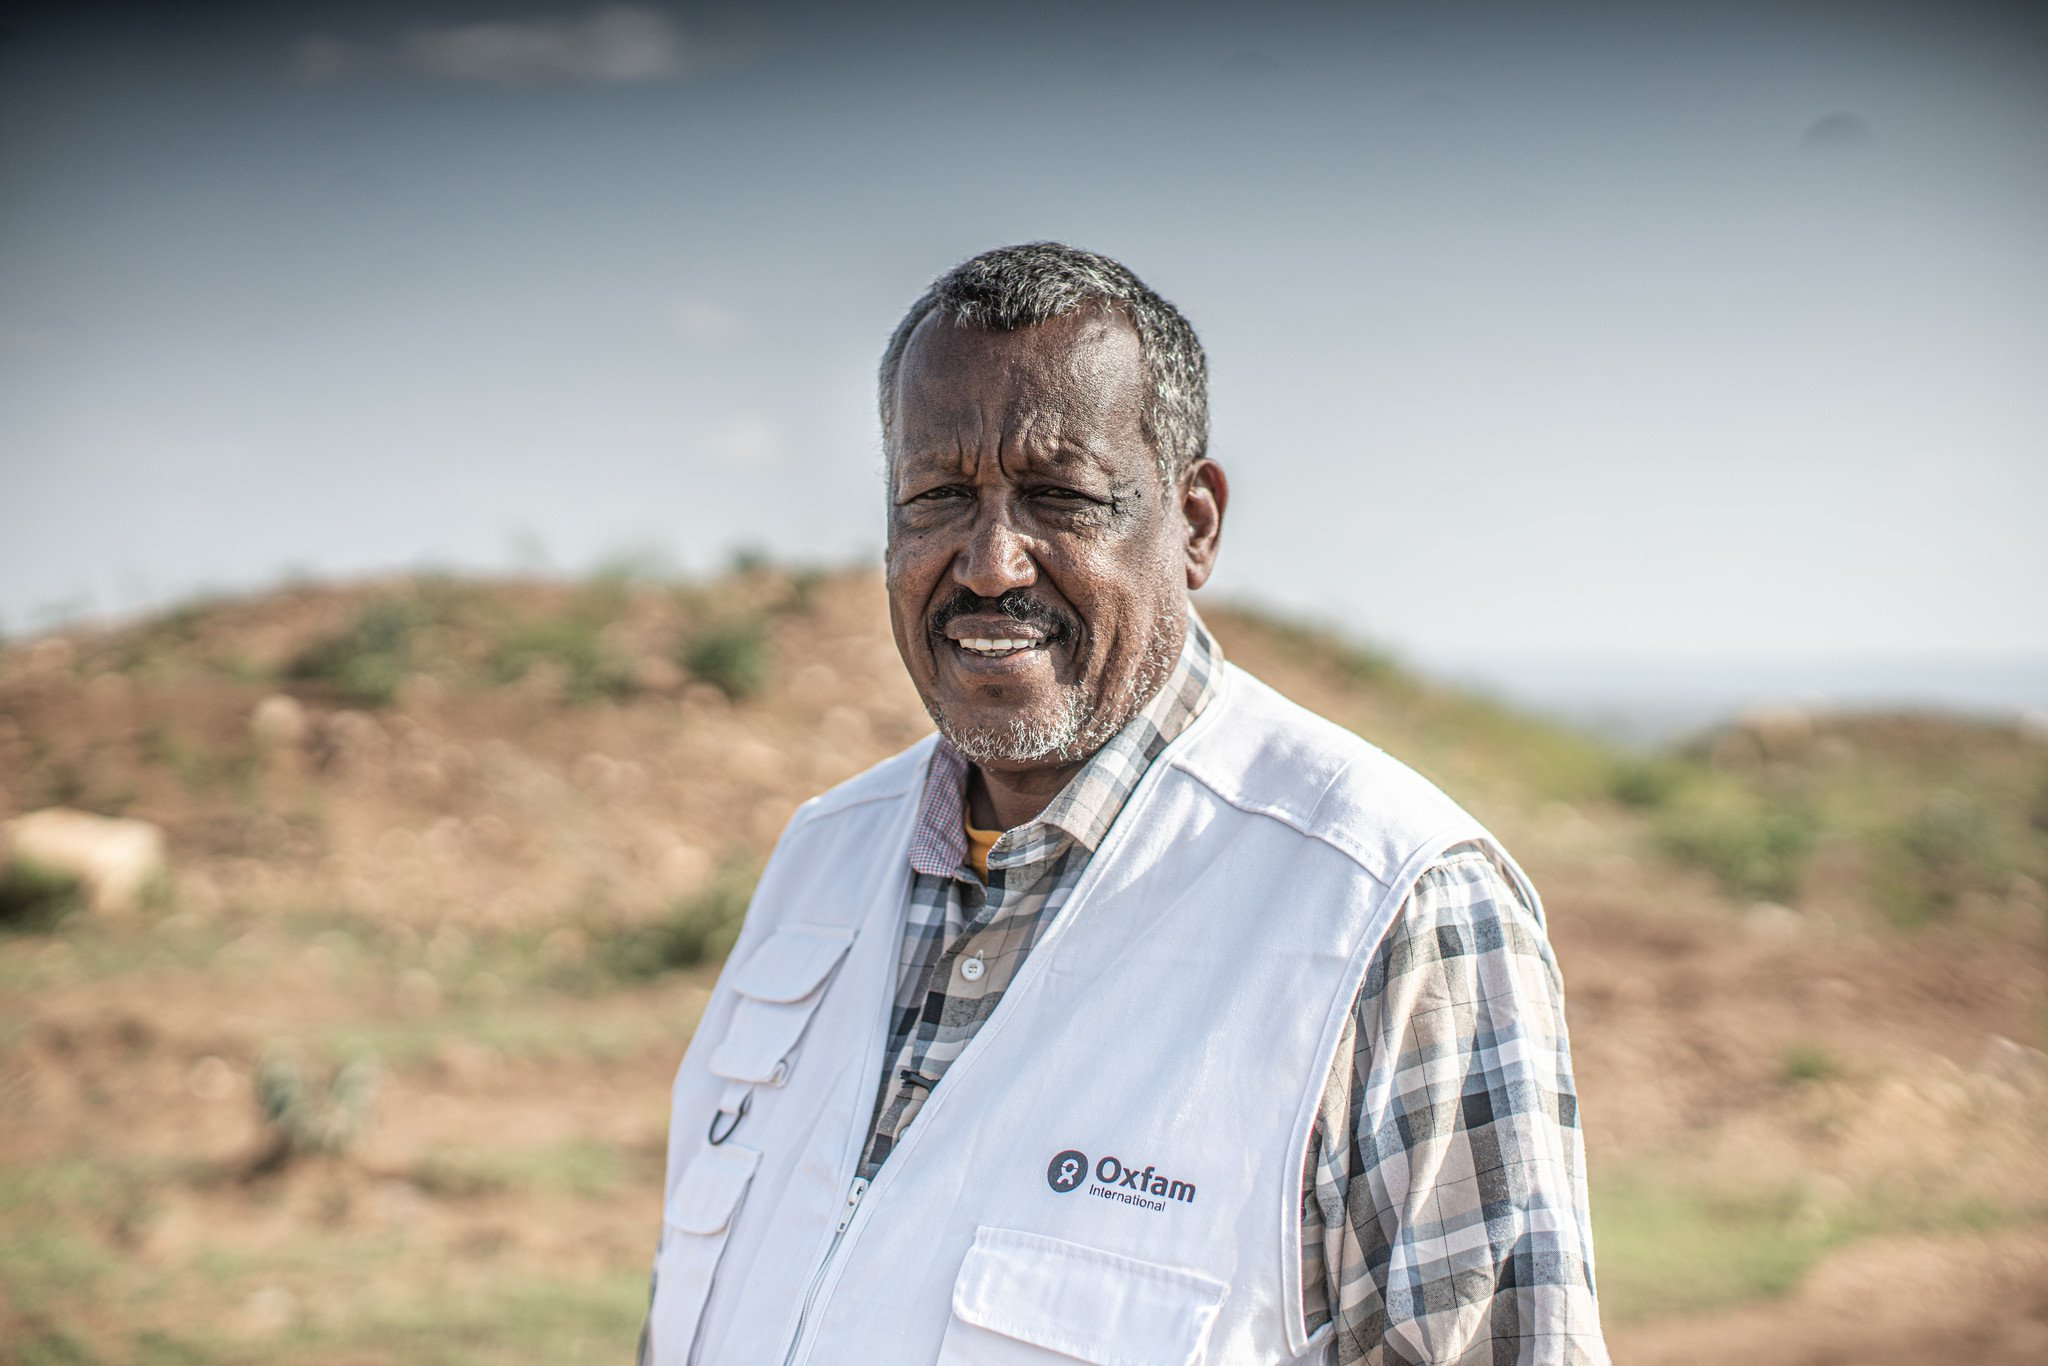 Million Ali is a program officer and livelihoods expert for Oxfam, based in Jijiga in the Somali Region.